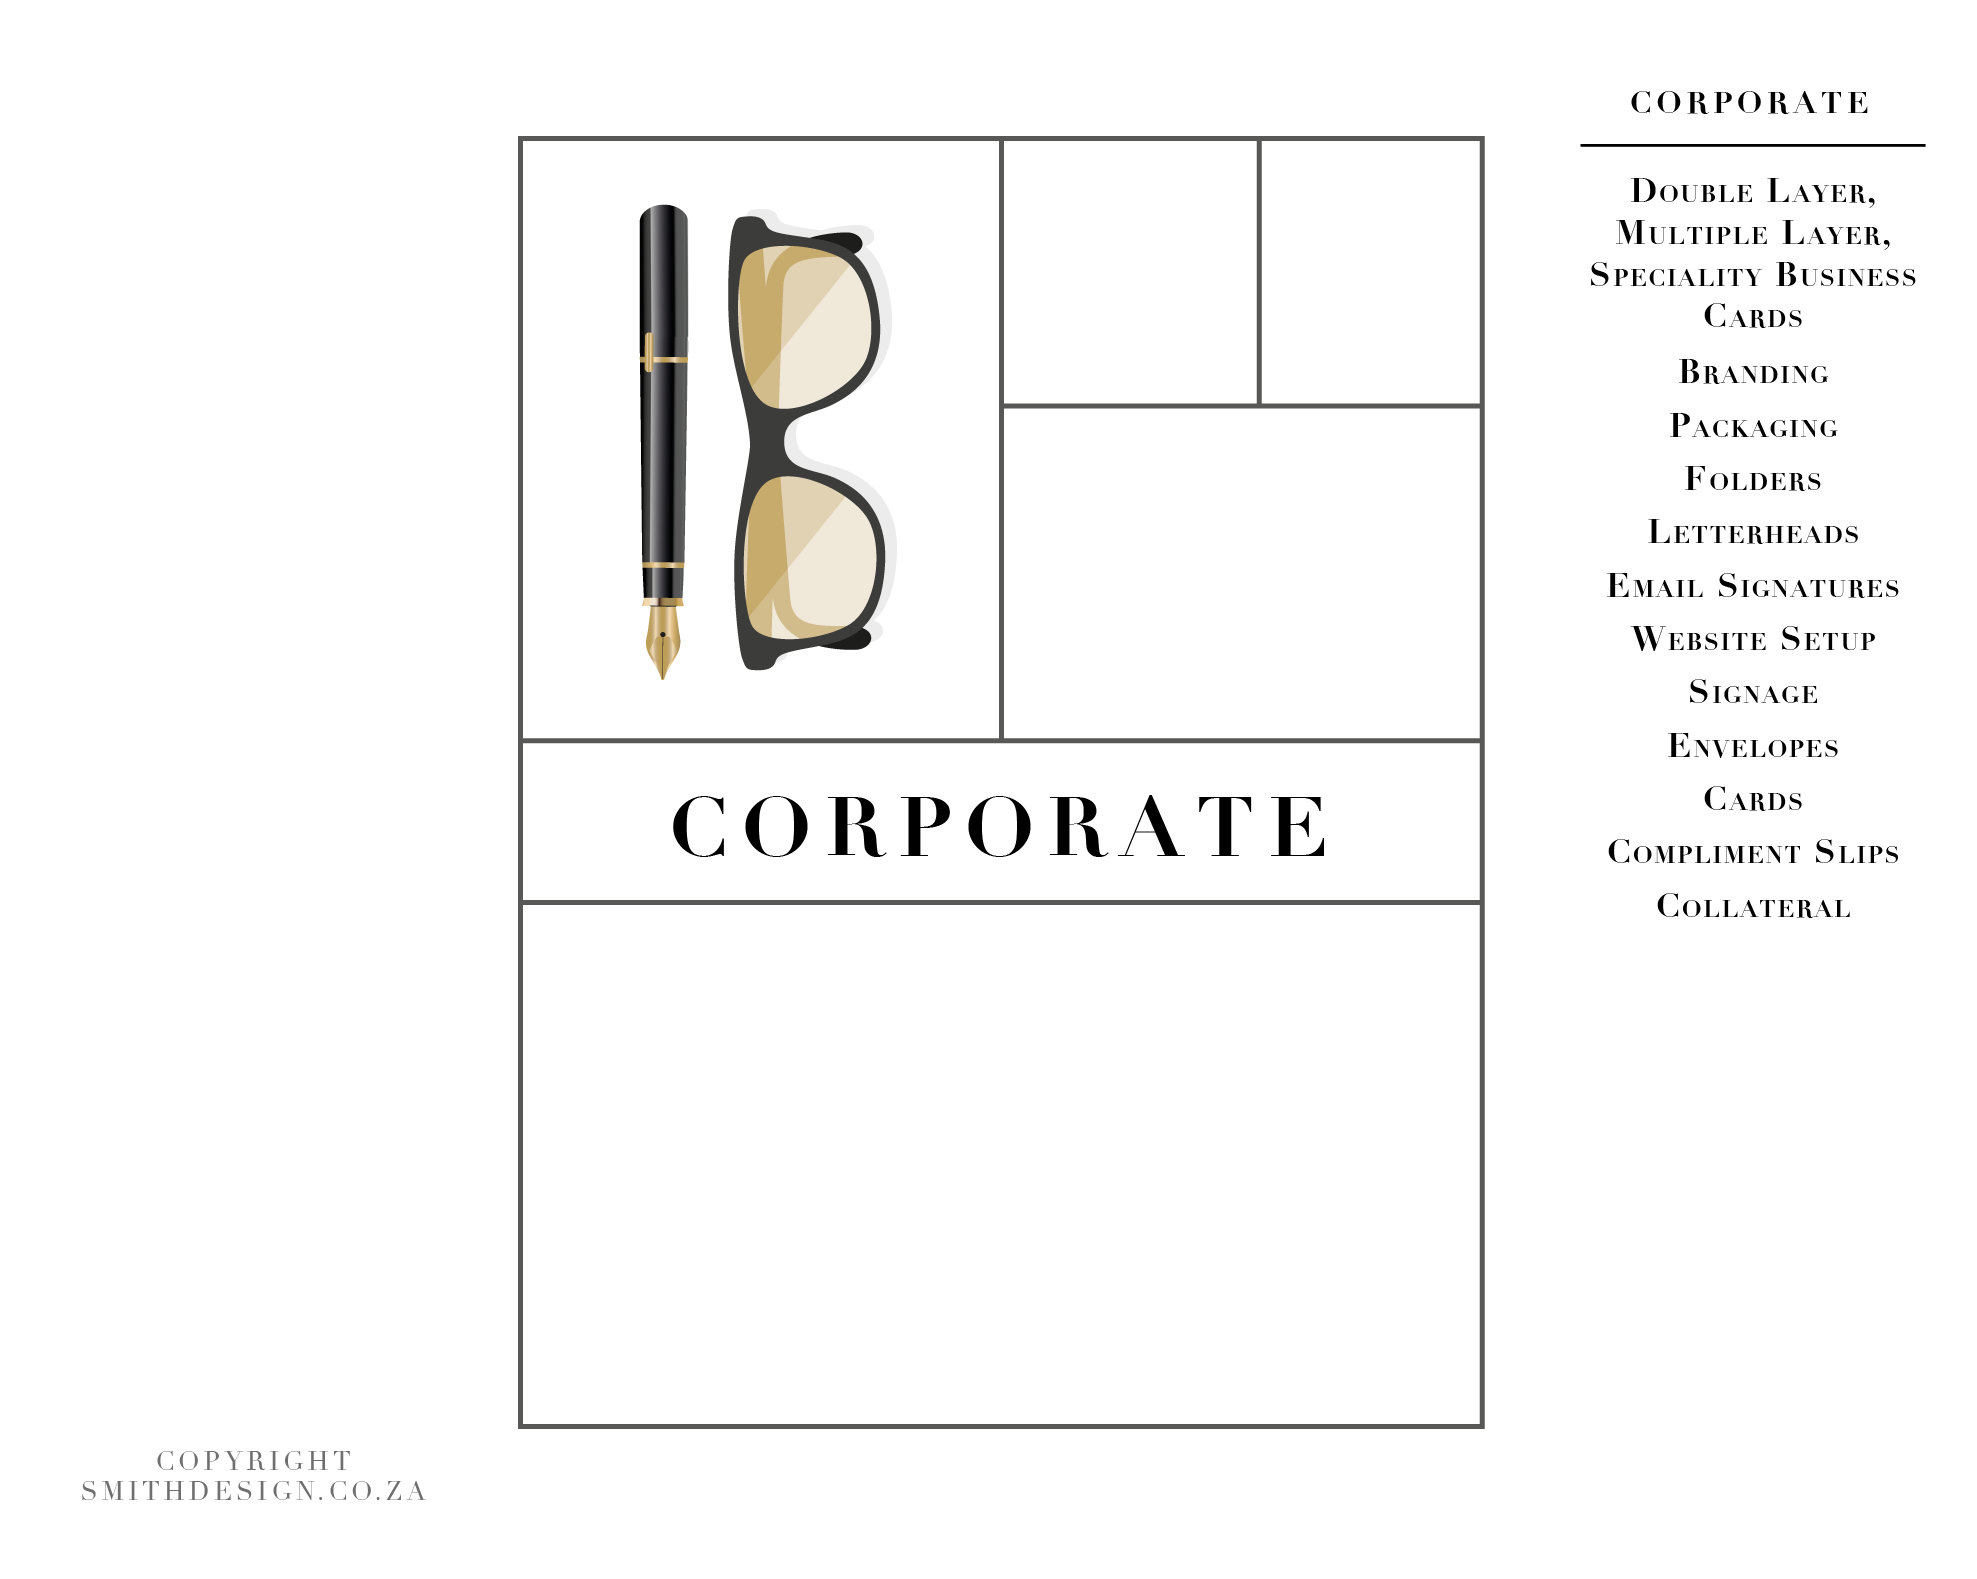 Smith Corporate Stationery